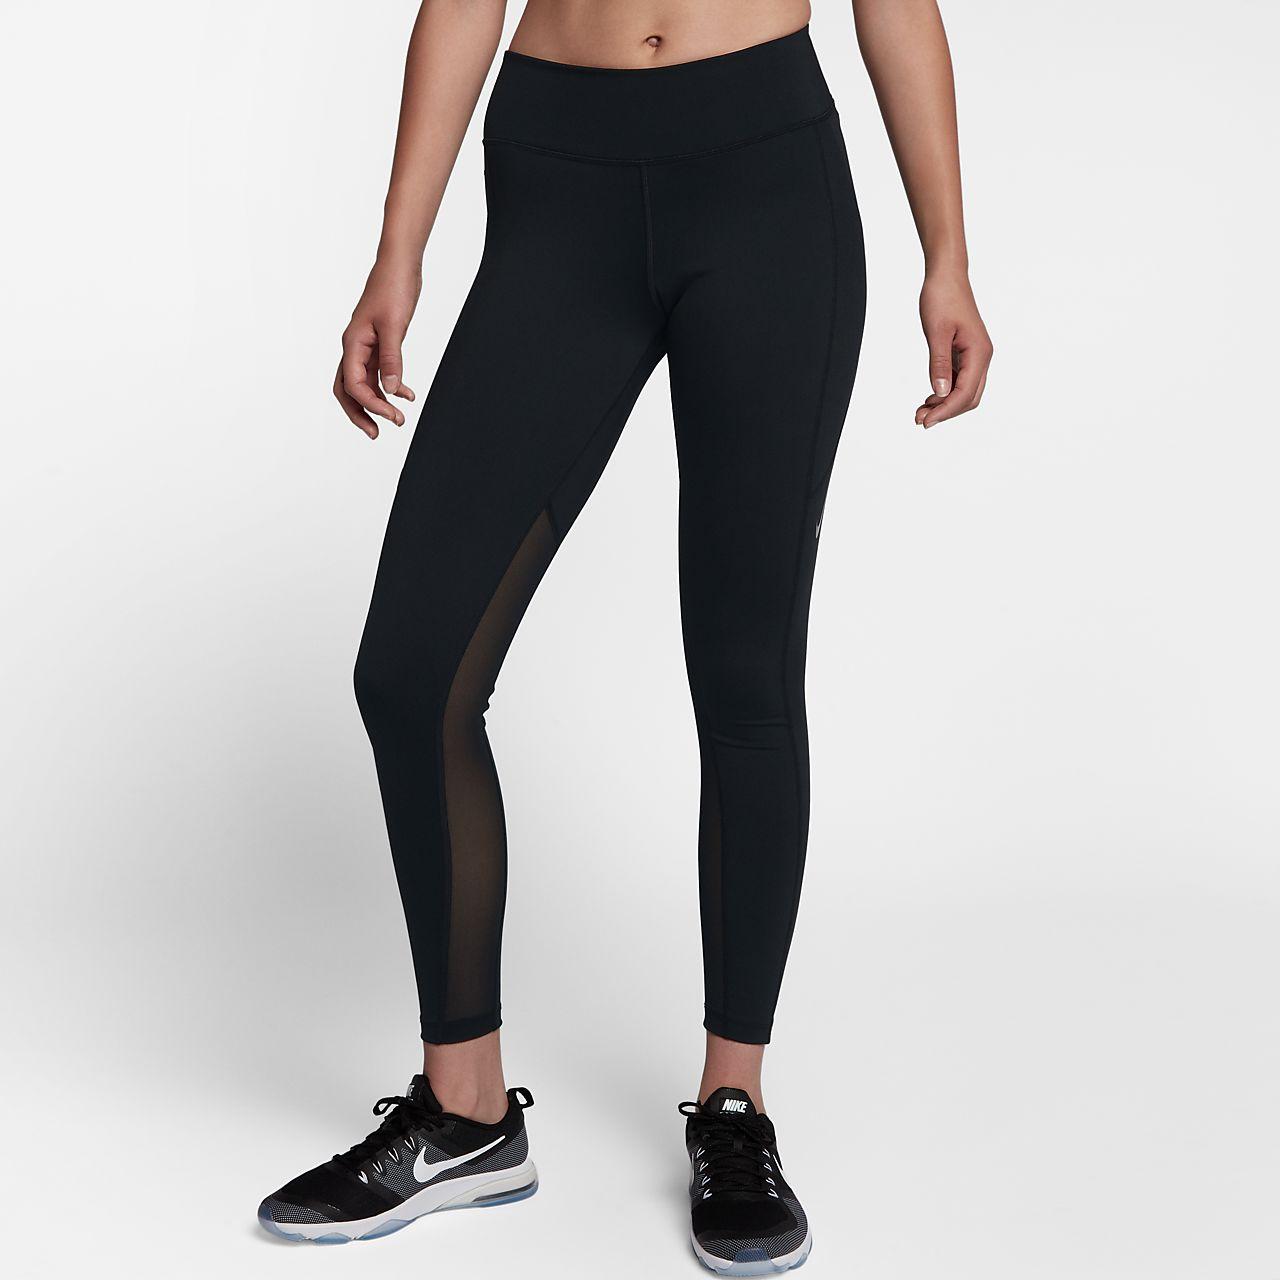 Nike Power Pocket Lux Womenu0026#39;s High-Rise Training Tights. Nike.com